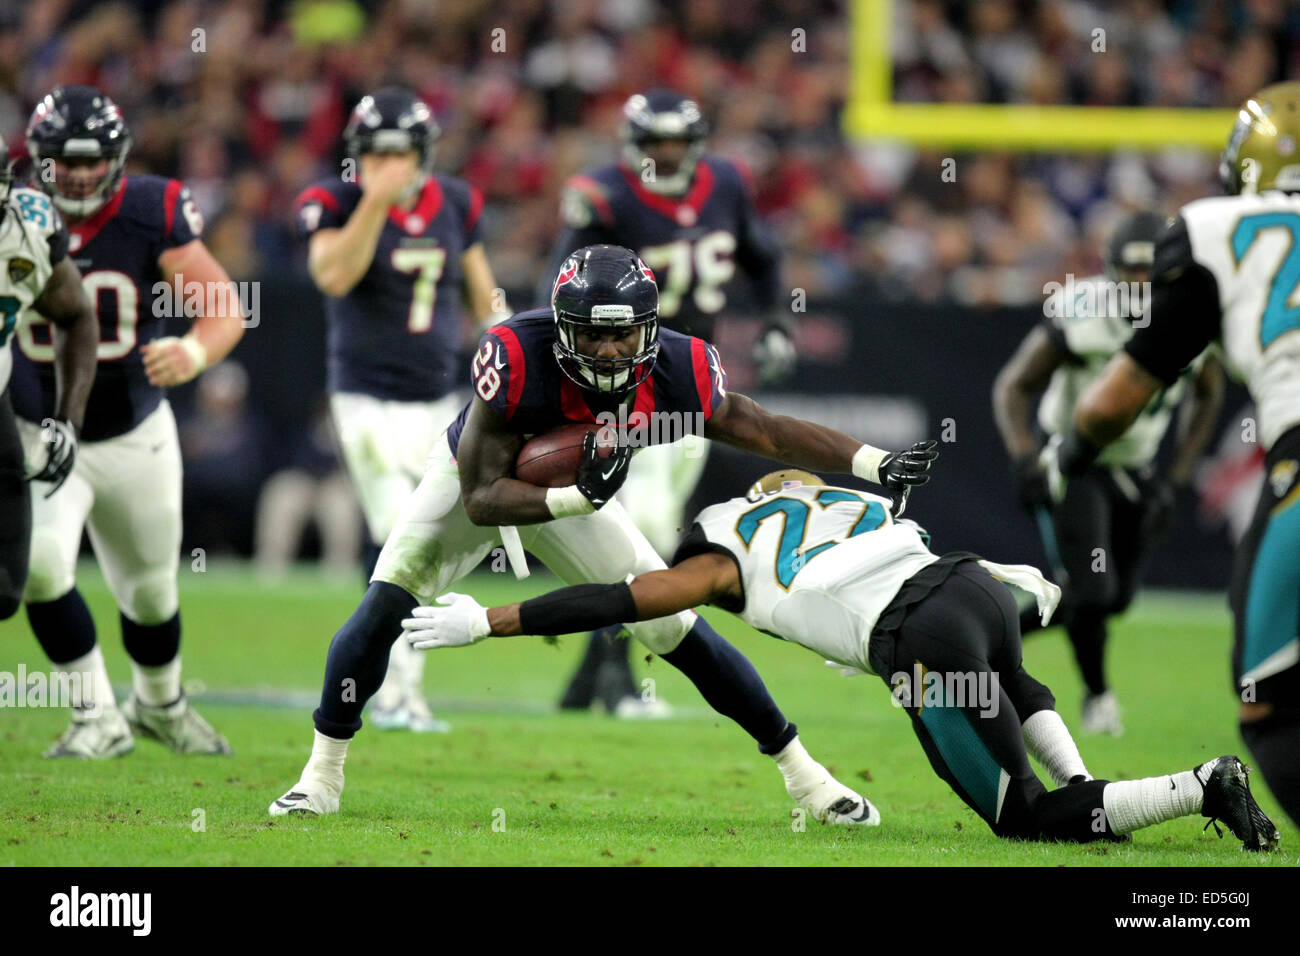 Houston, TX, USA. 28th Dec, 2014. Houston Texans running back Alfred Blue #28 looks to sidestep Jacksonville Jaguars - Stock Image